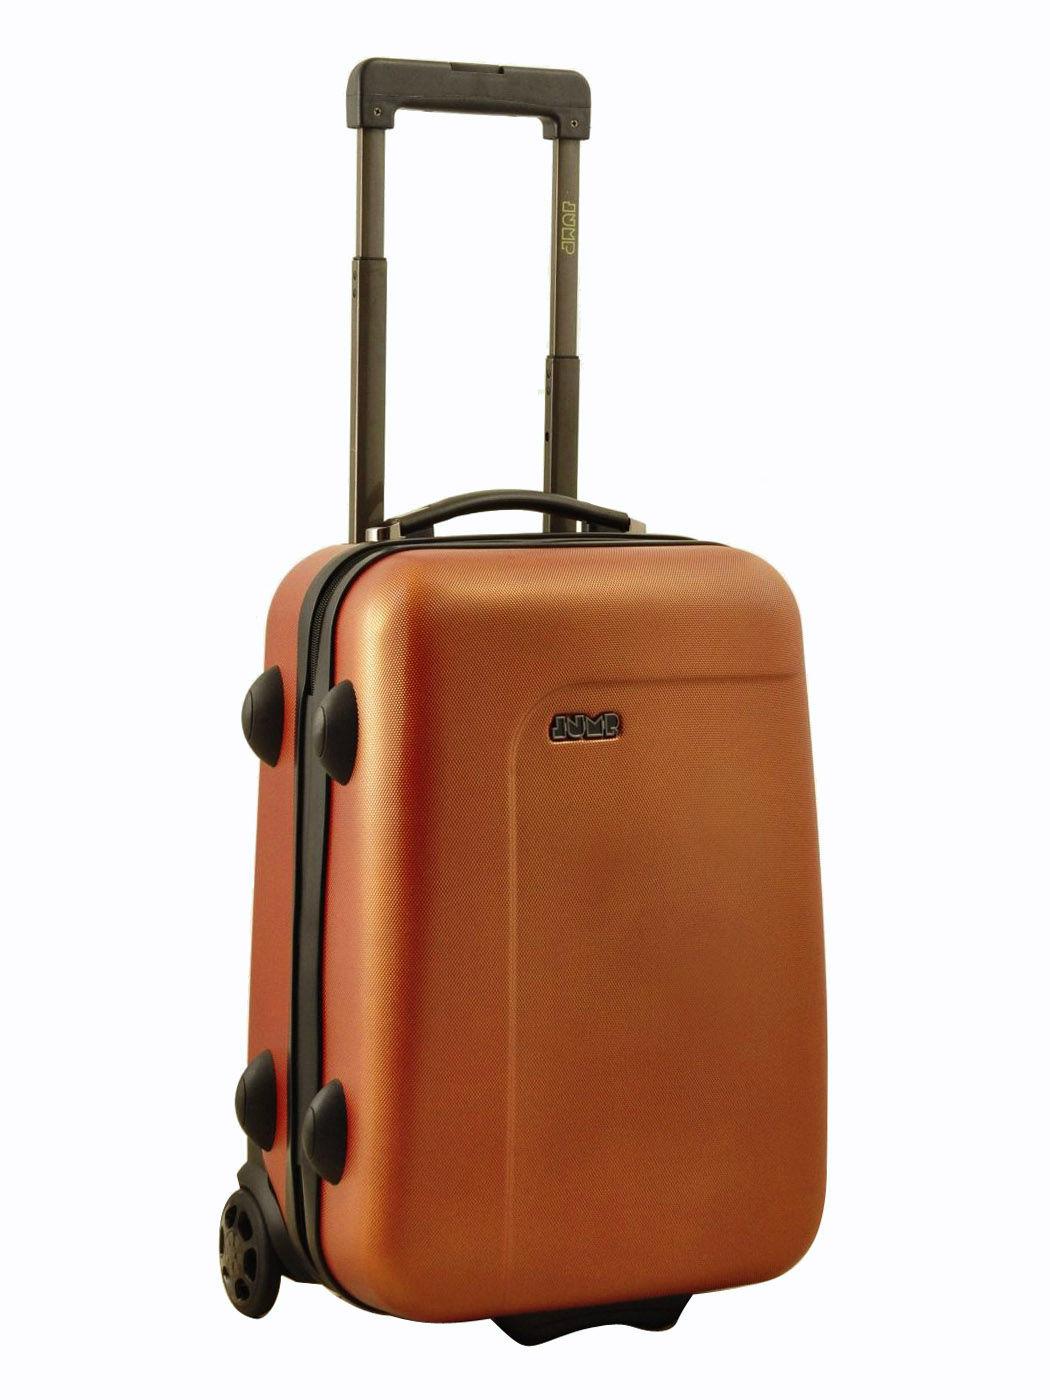 valise 2 roues rigide jump orange txc pc txc100 valise 2 roues. Black Bedroom Furniture Sets. Home Design Ideas